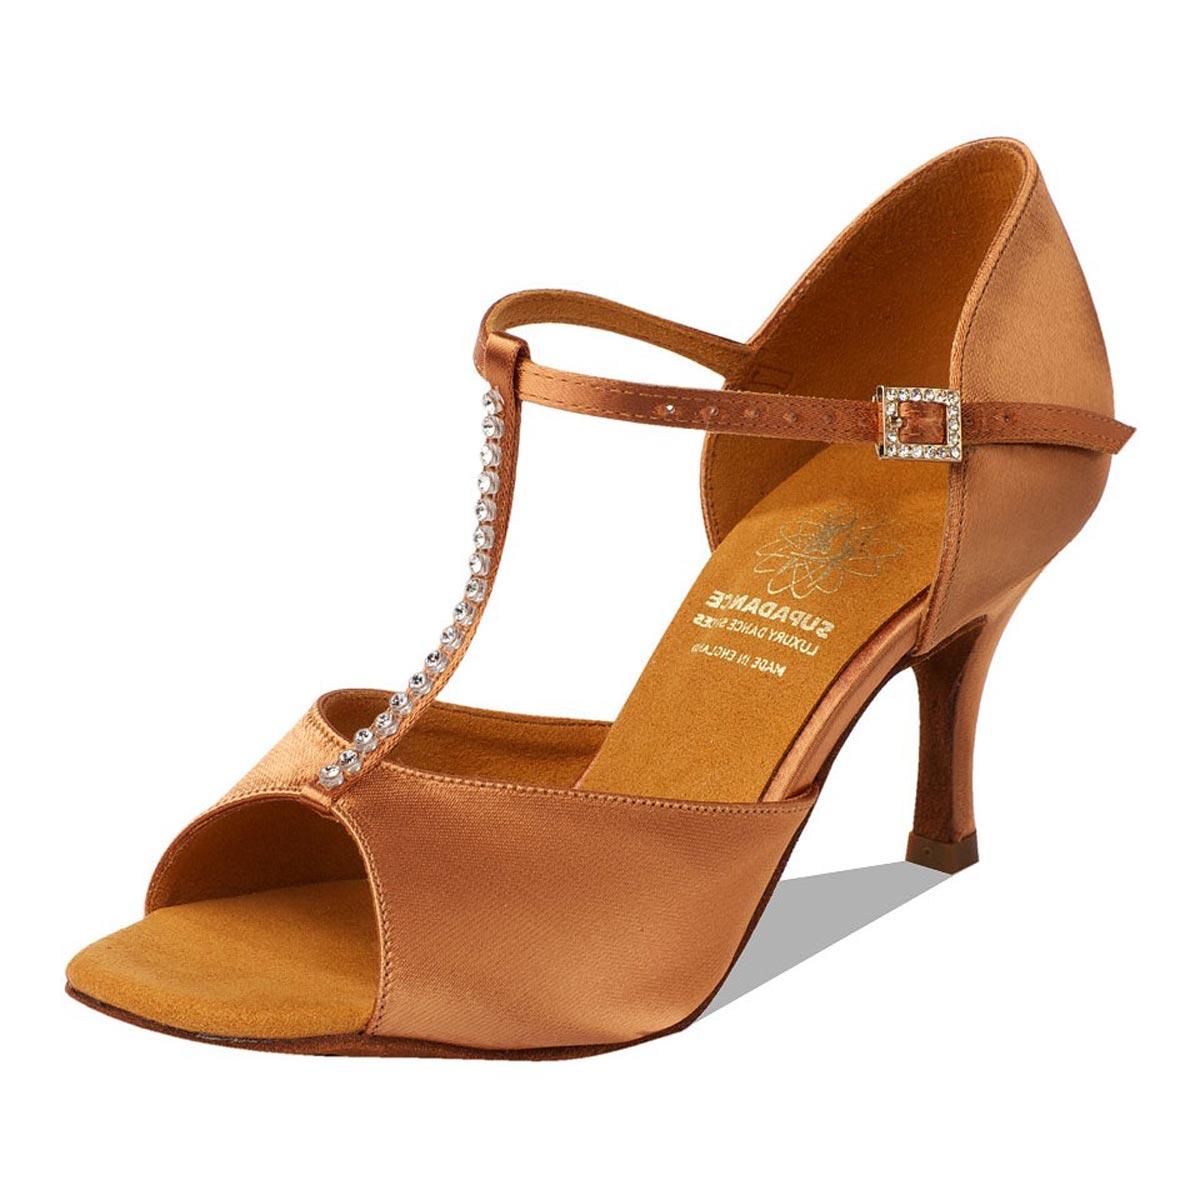 Narrow Fitting Dance Shoes Uk